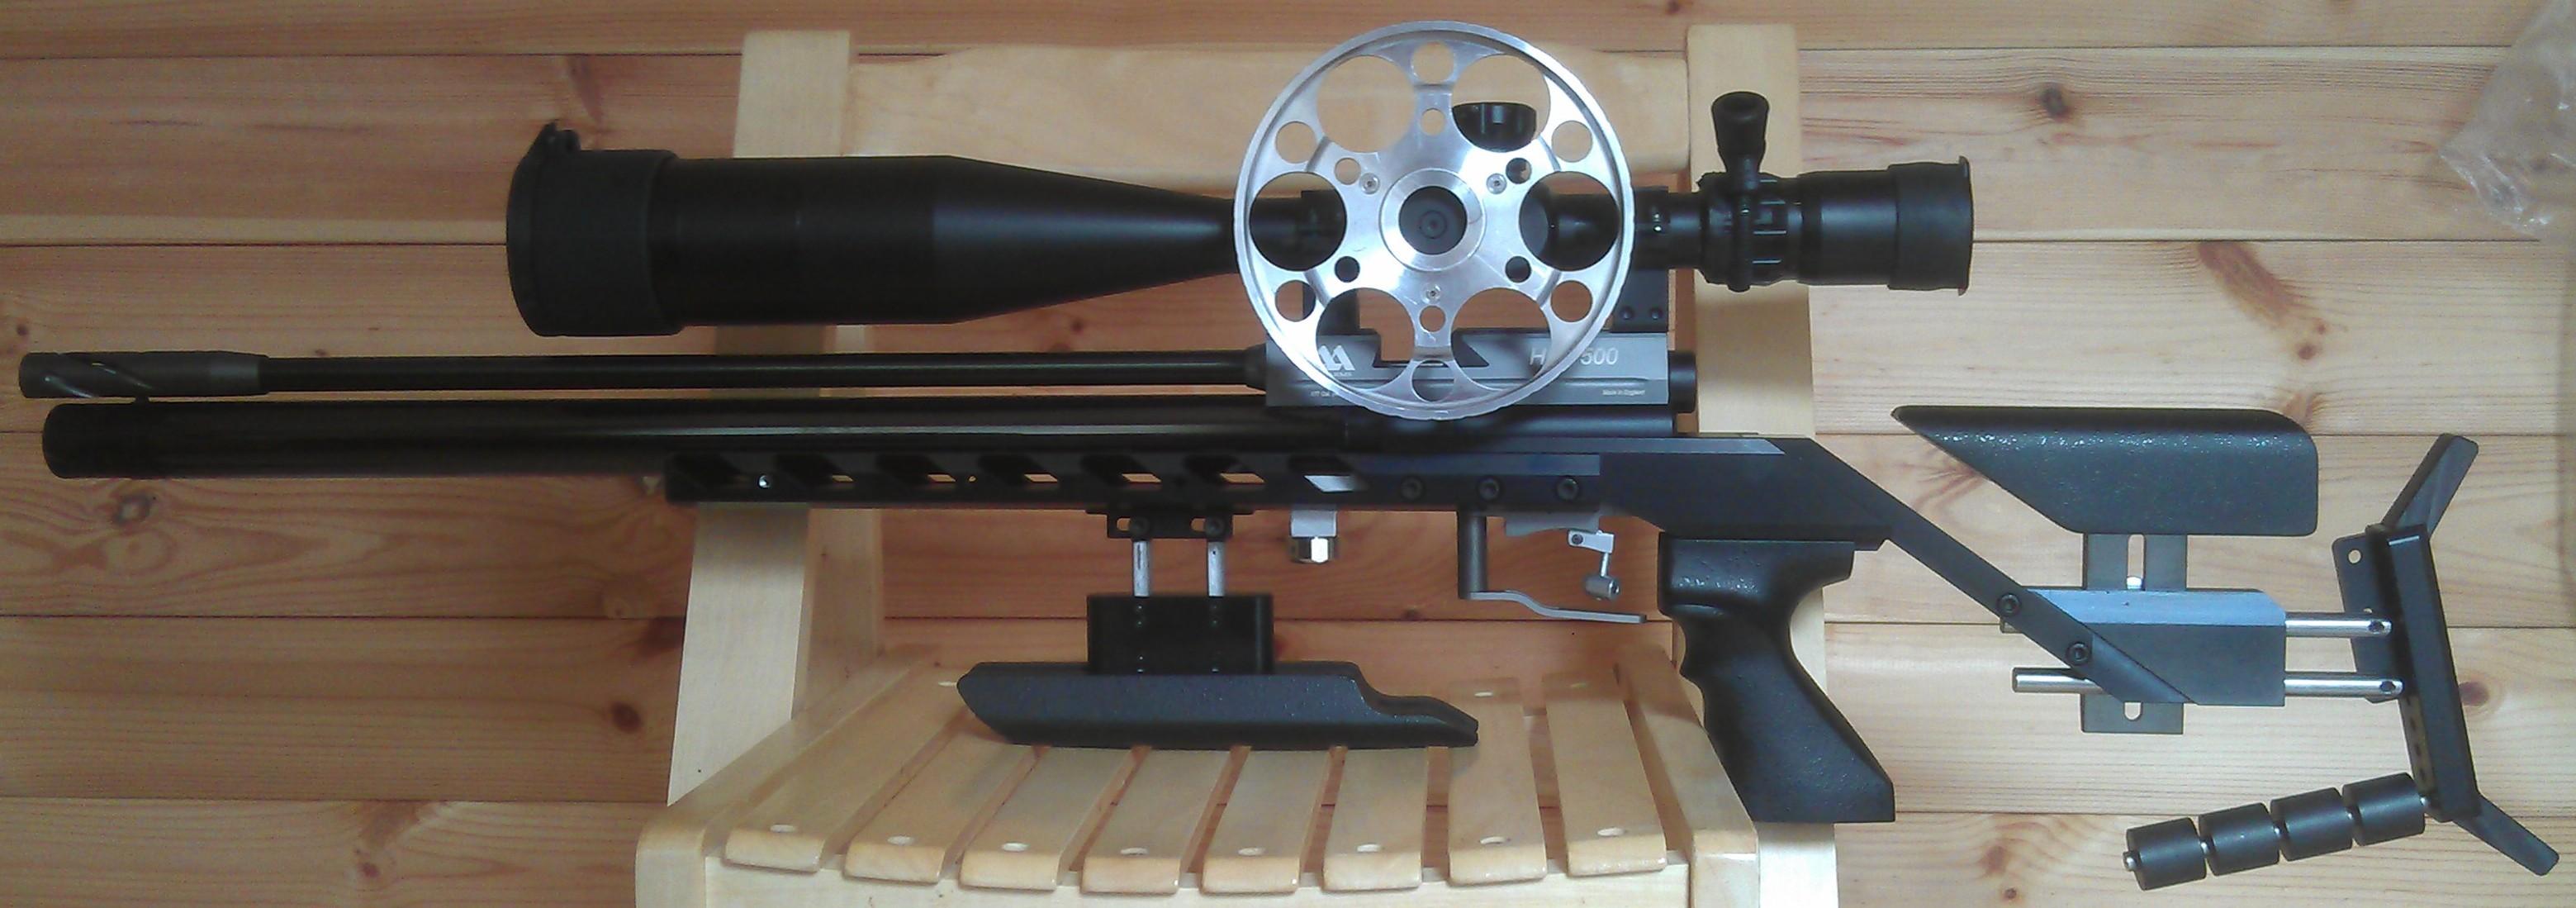 ULTRA S400/500 STOCK - Sure Shot AirgunsSure Shot Airguns